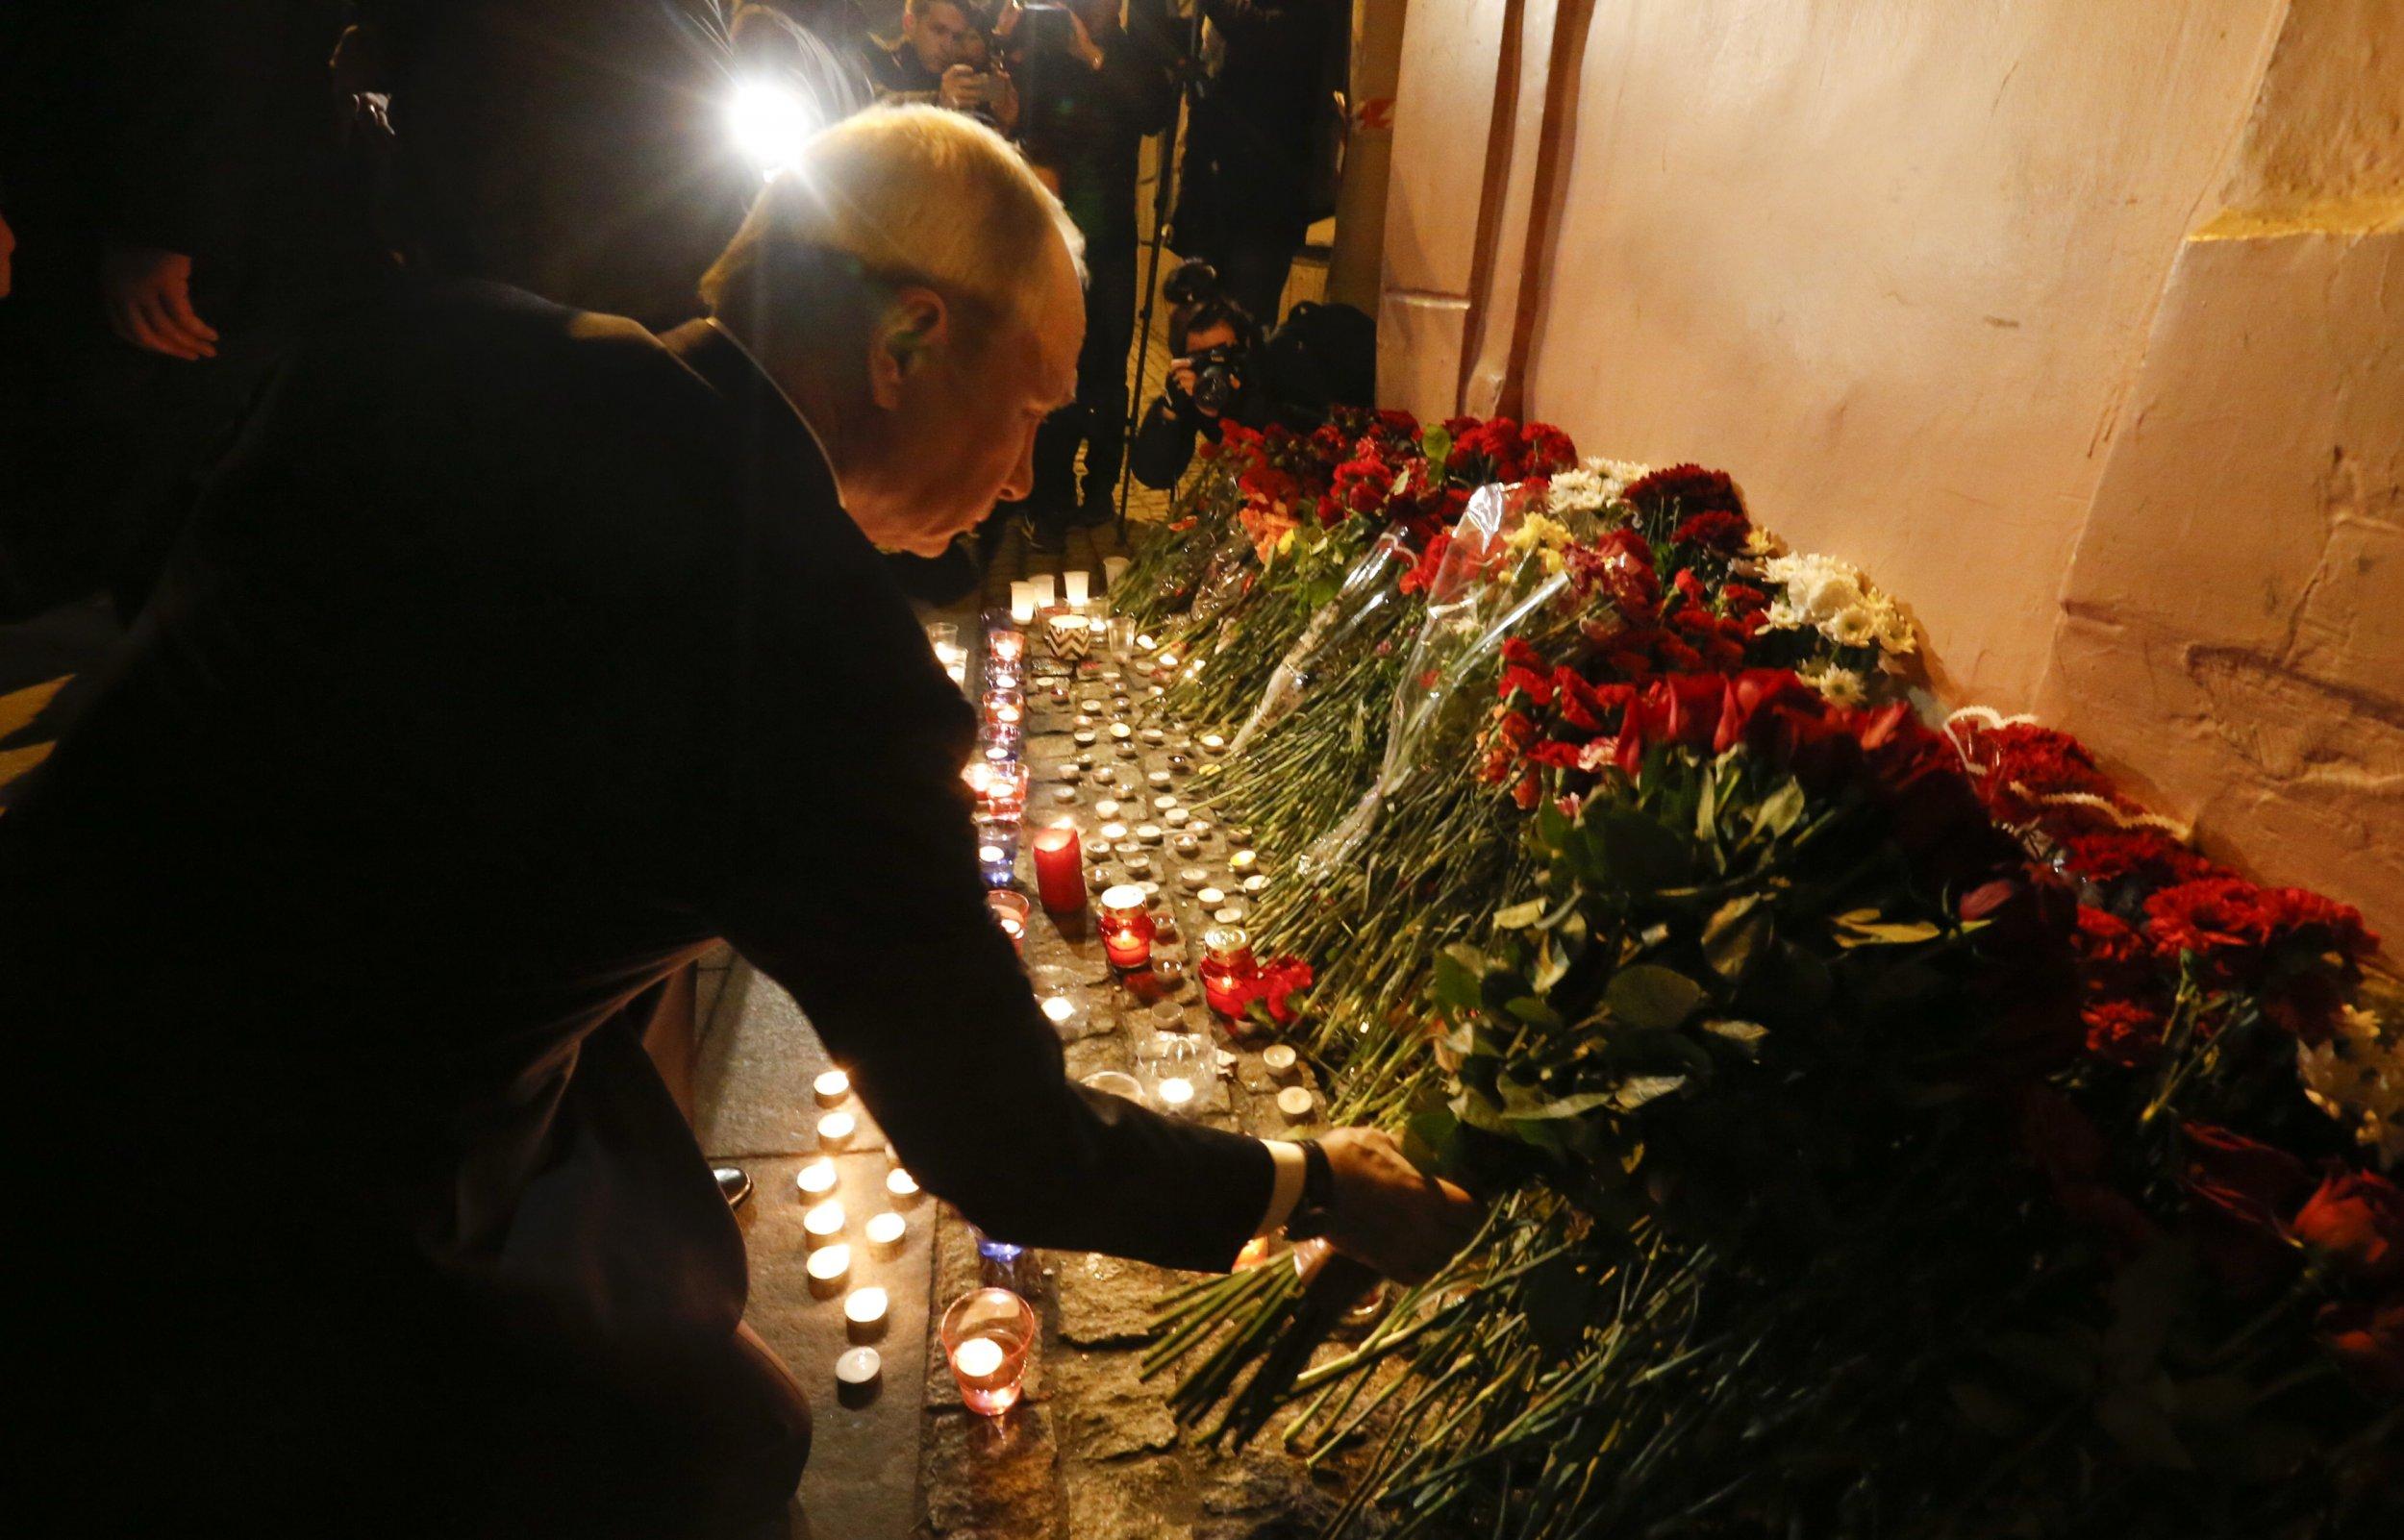 Russian president Vladimir Putin puts flowers down in St. Petersburg